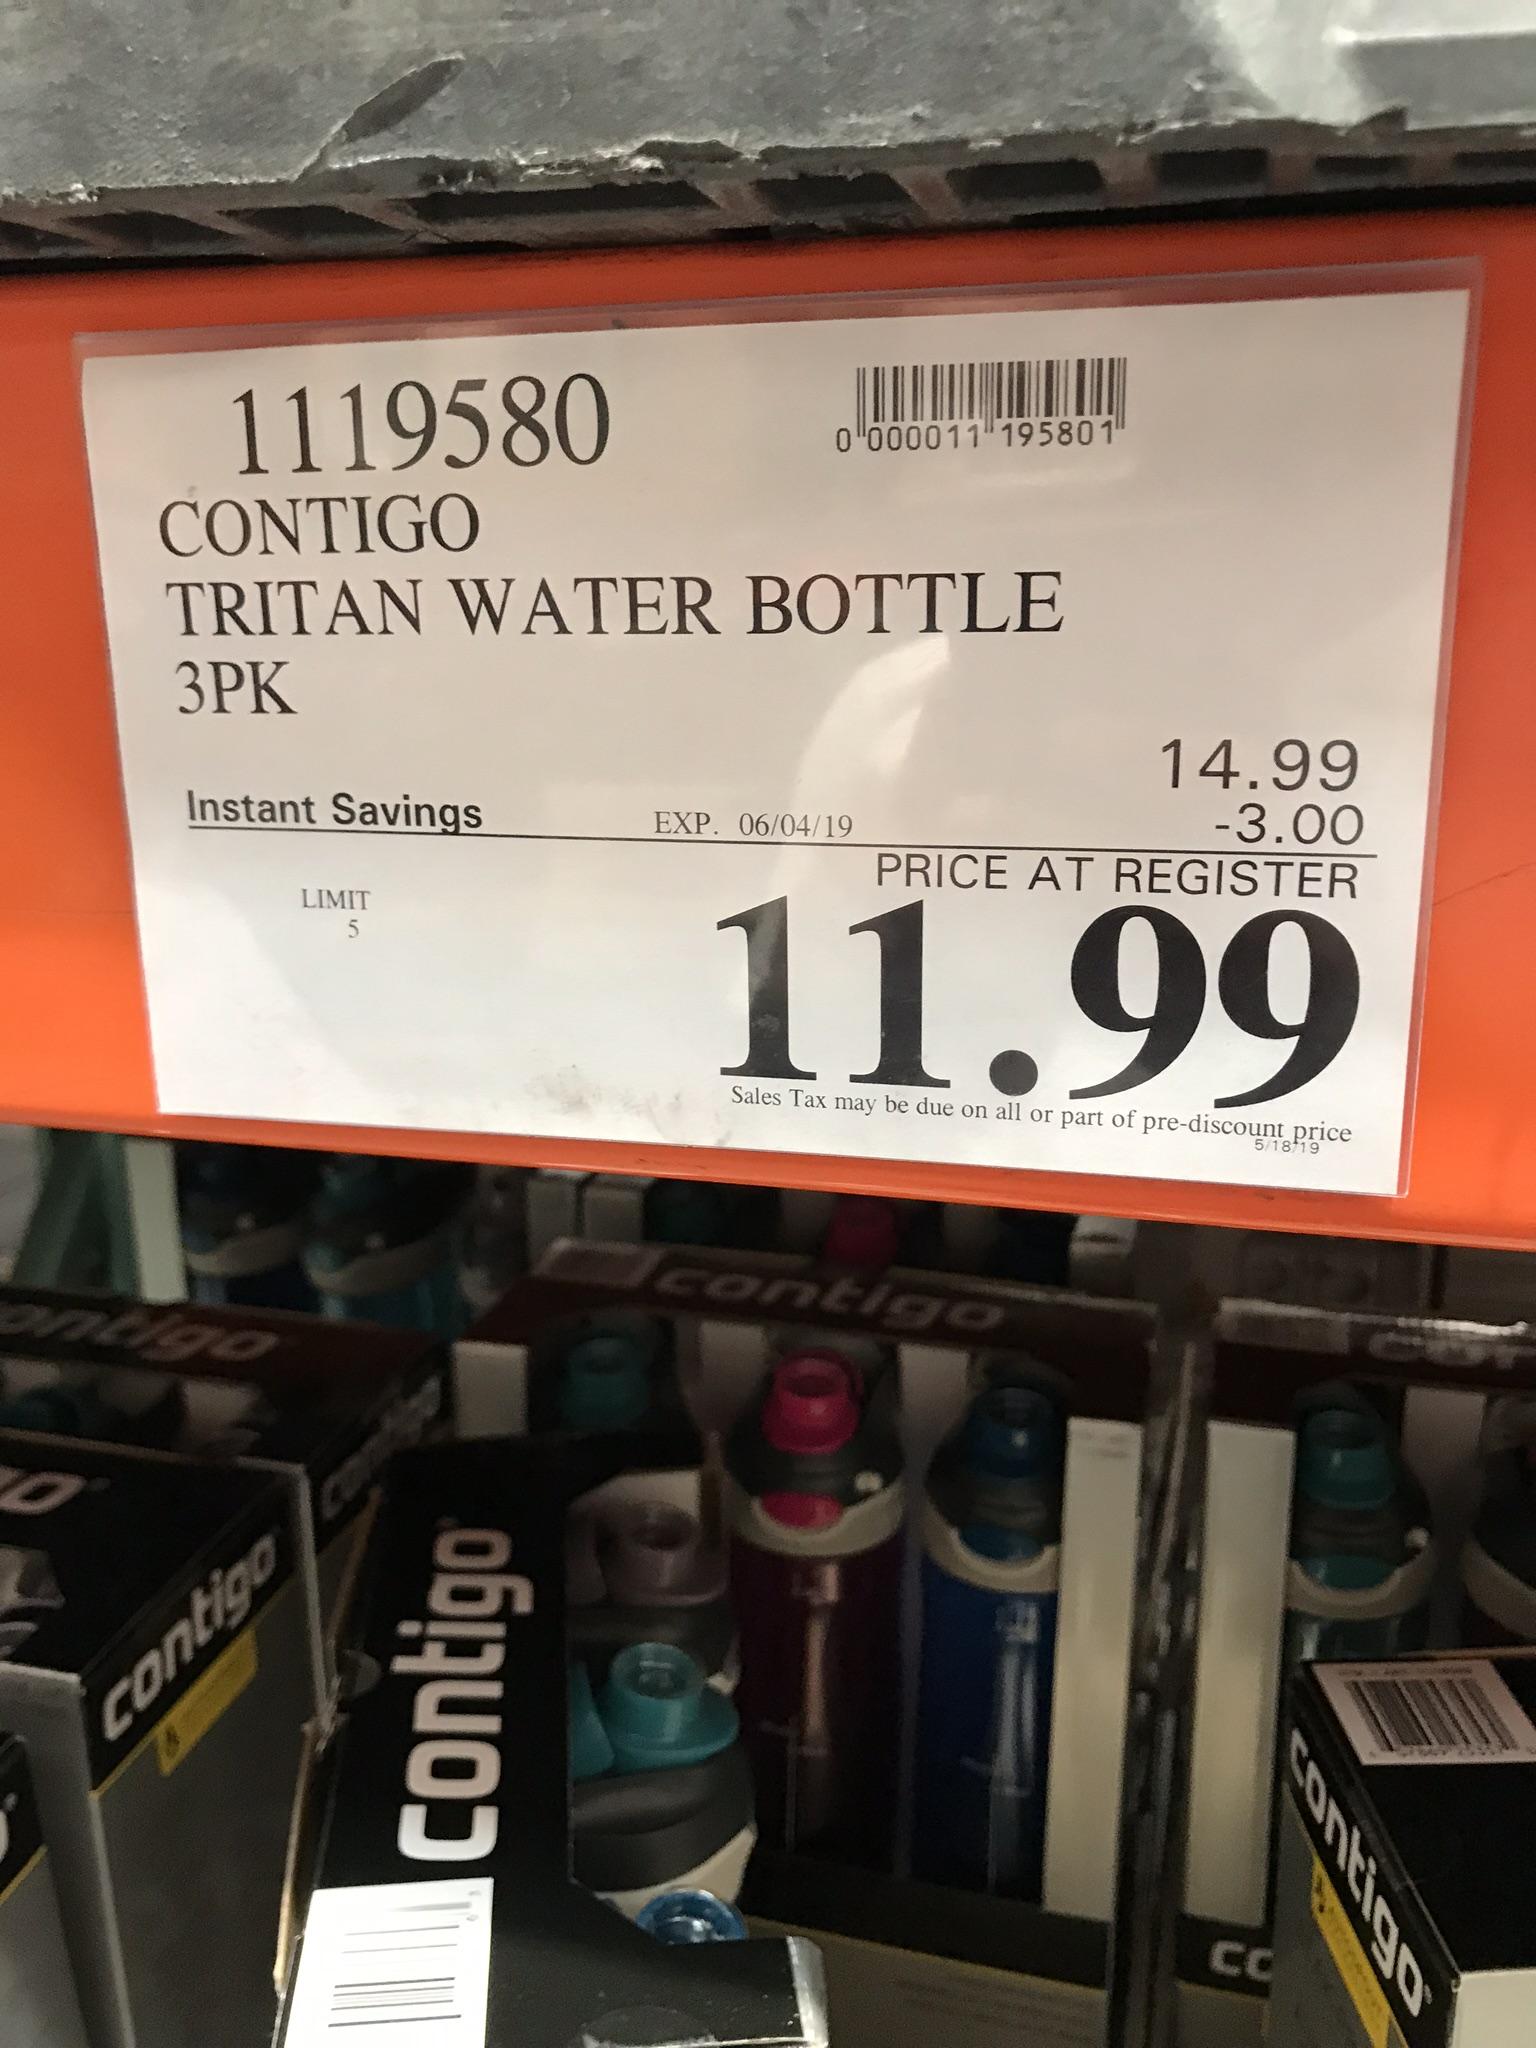 Contigo Tritan Water Bottle 3PK @Costco B&M YMMV $11.99